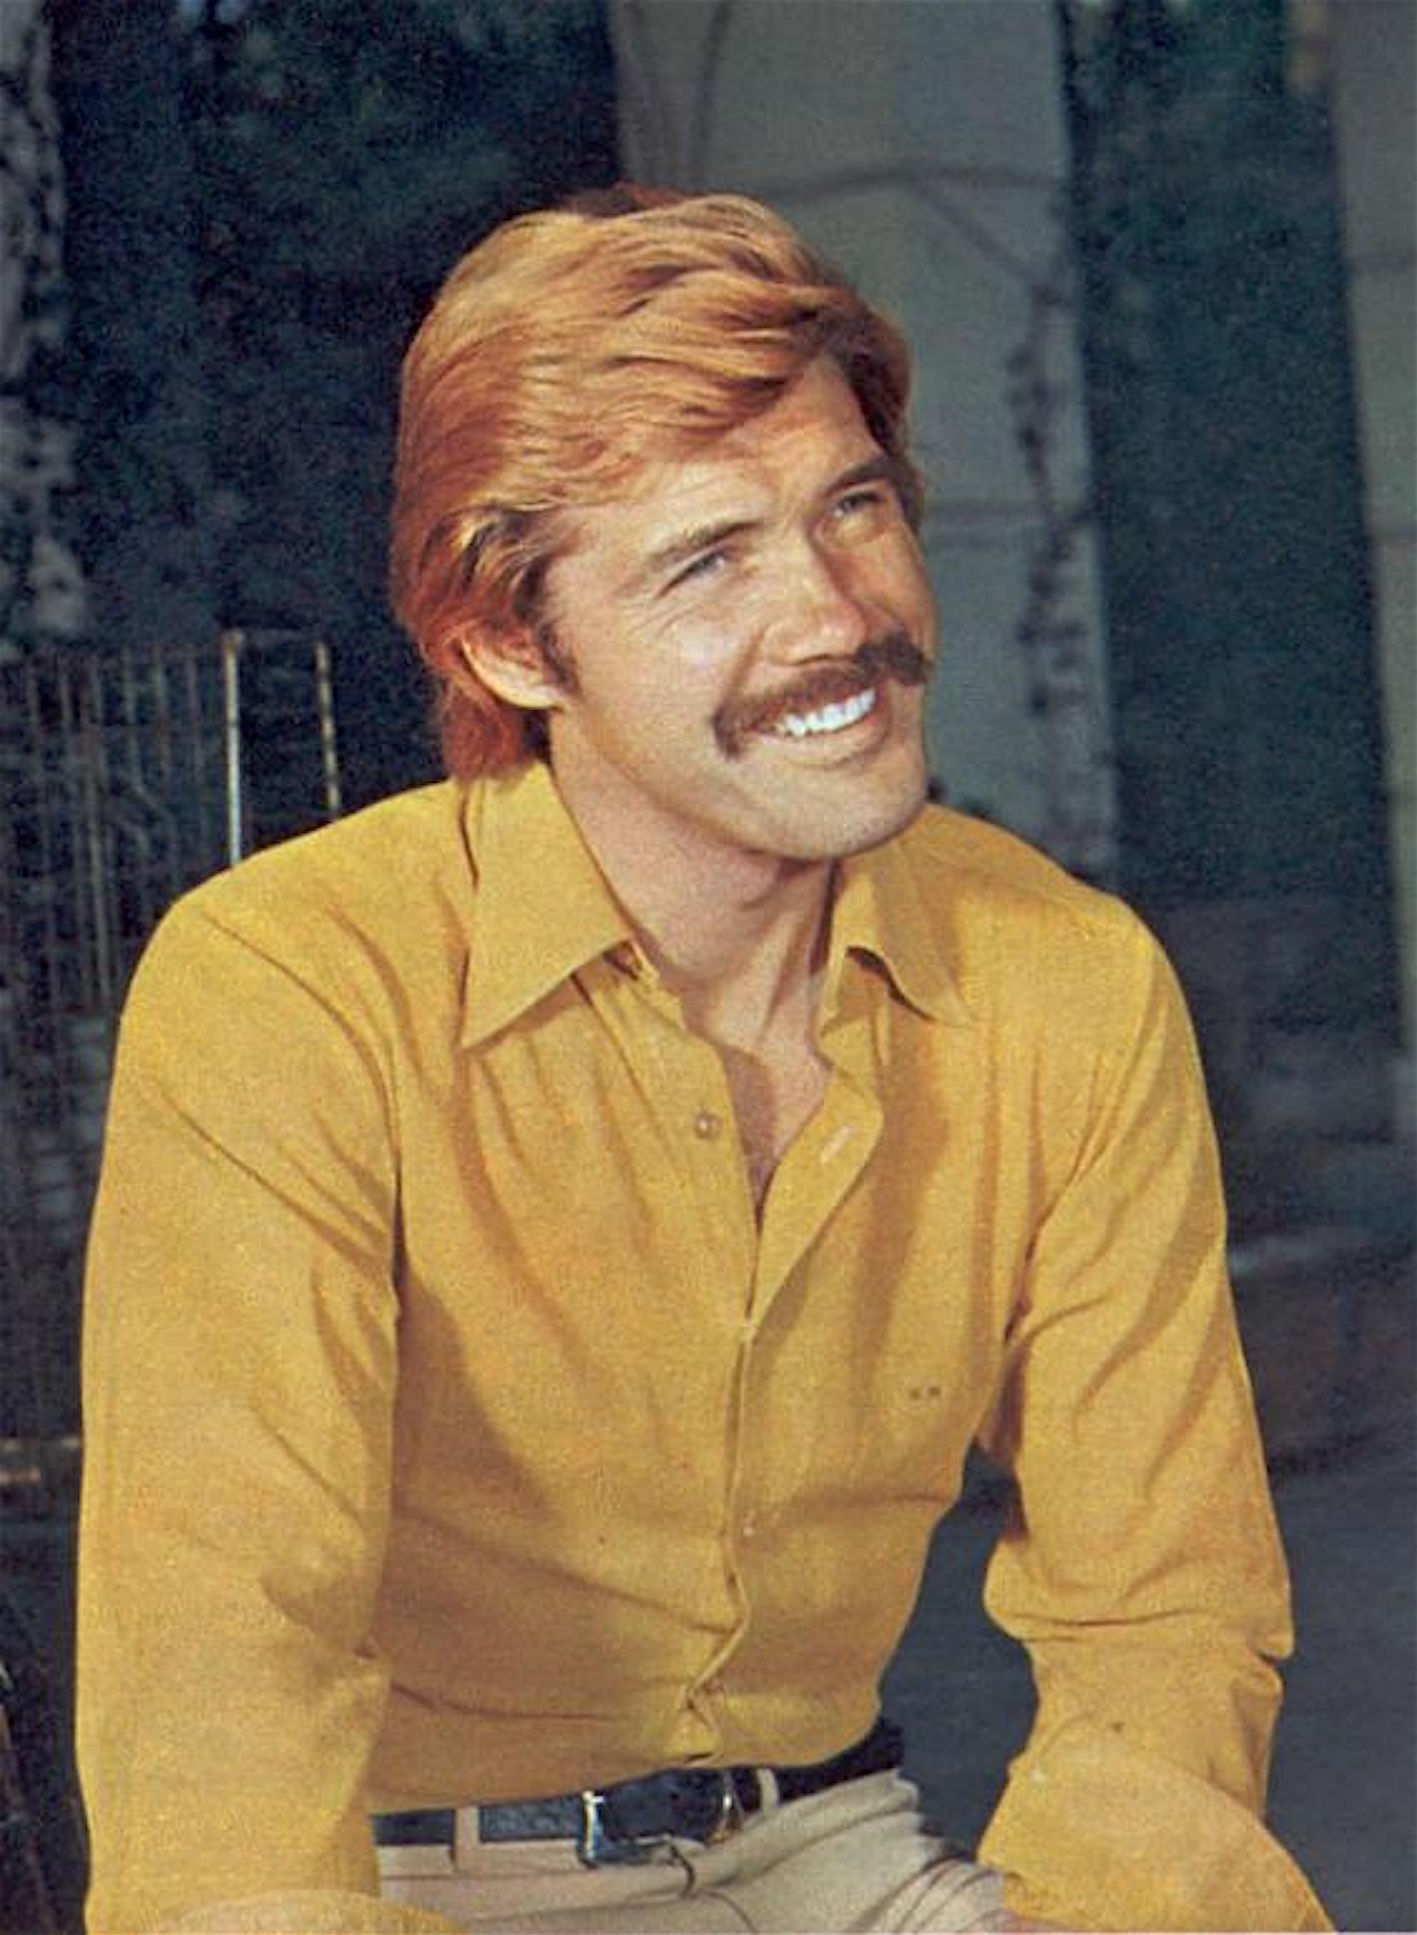 Kirk Morris